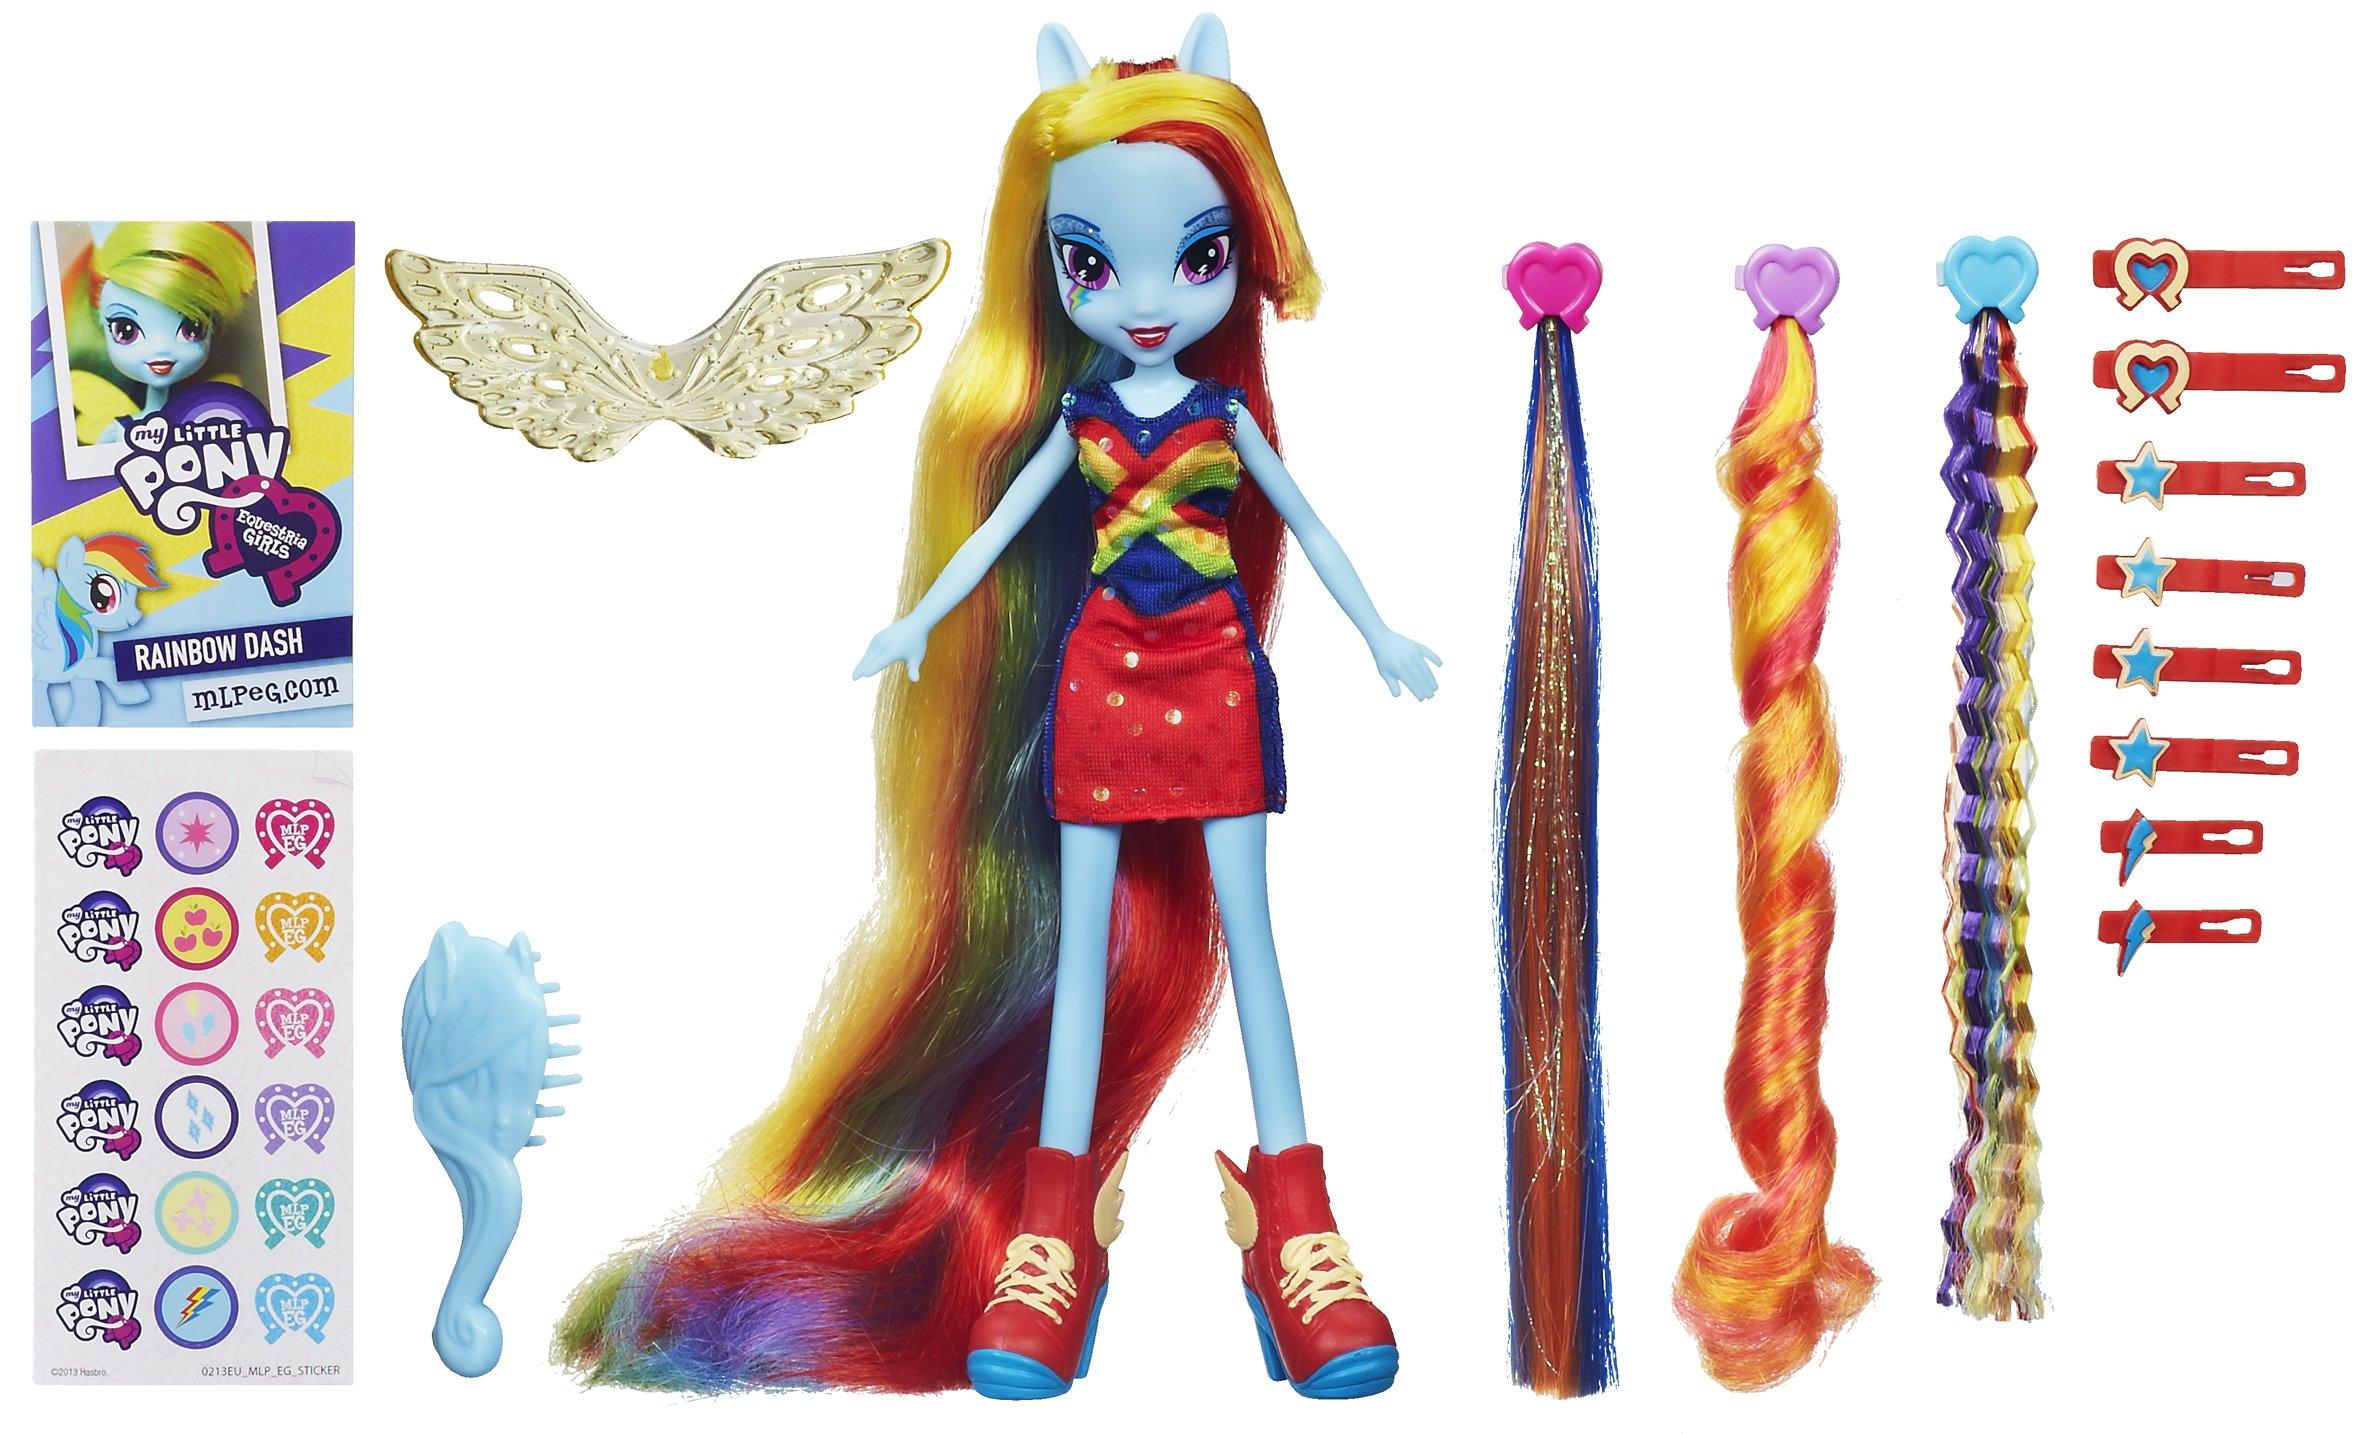 HASBRO Equestria Girls - Mon petit poney devient une fille ! Rainbow_Dash_Equestria_Girls_hairstyling_doll